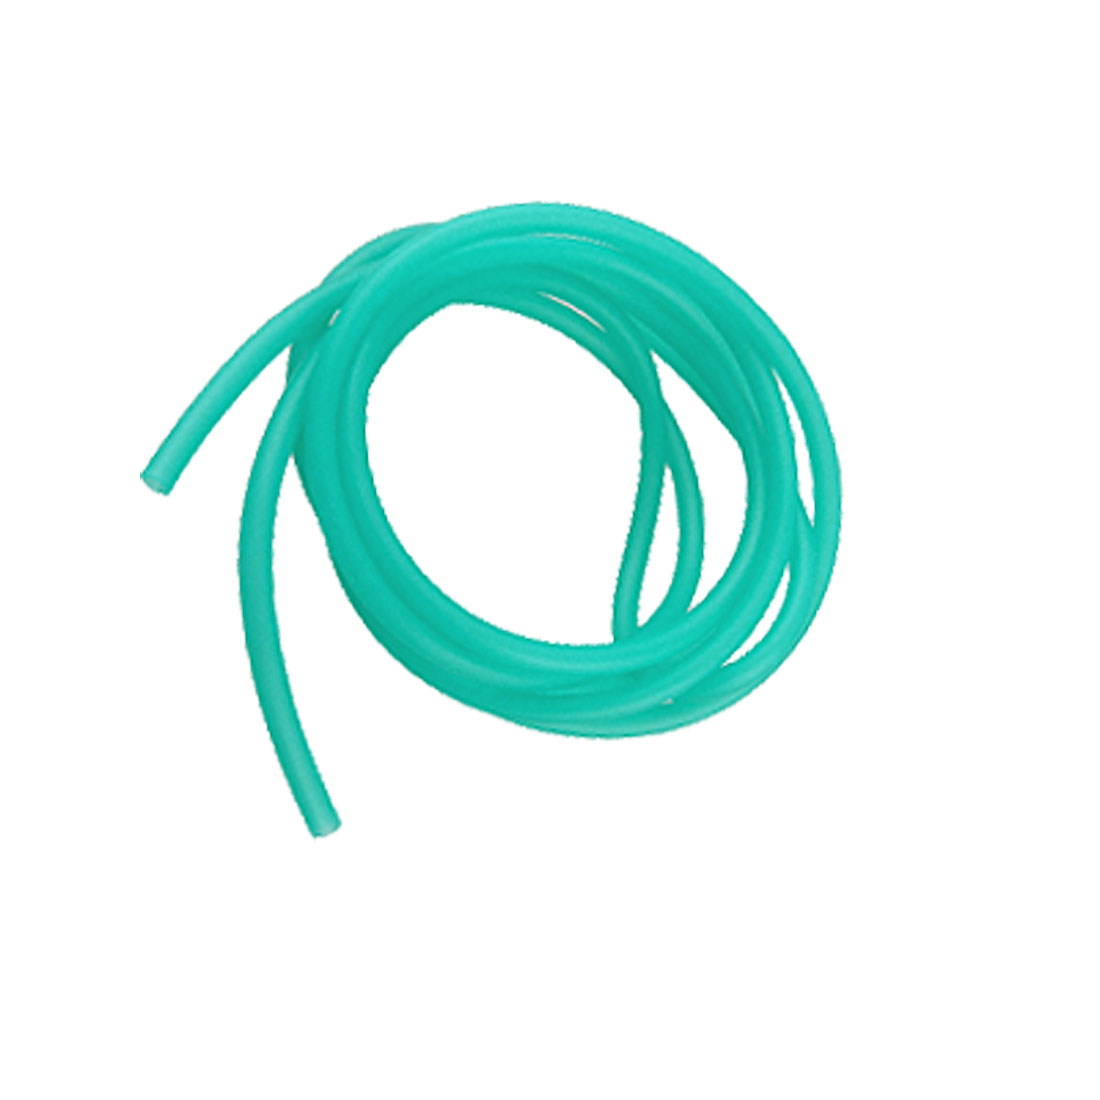 2 Pcs 2.0M Green Flexible Air Pump Bubble Oxygen Pipe Tube for Fish Tank